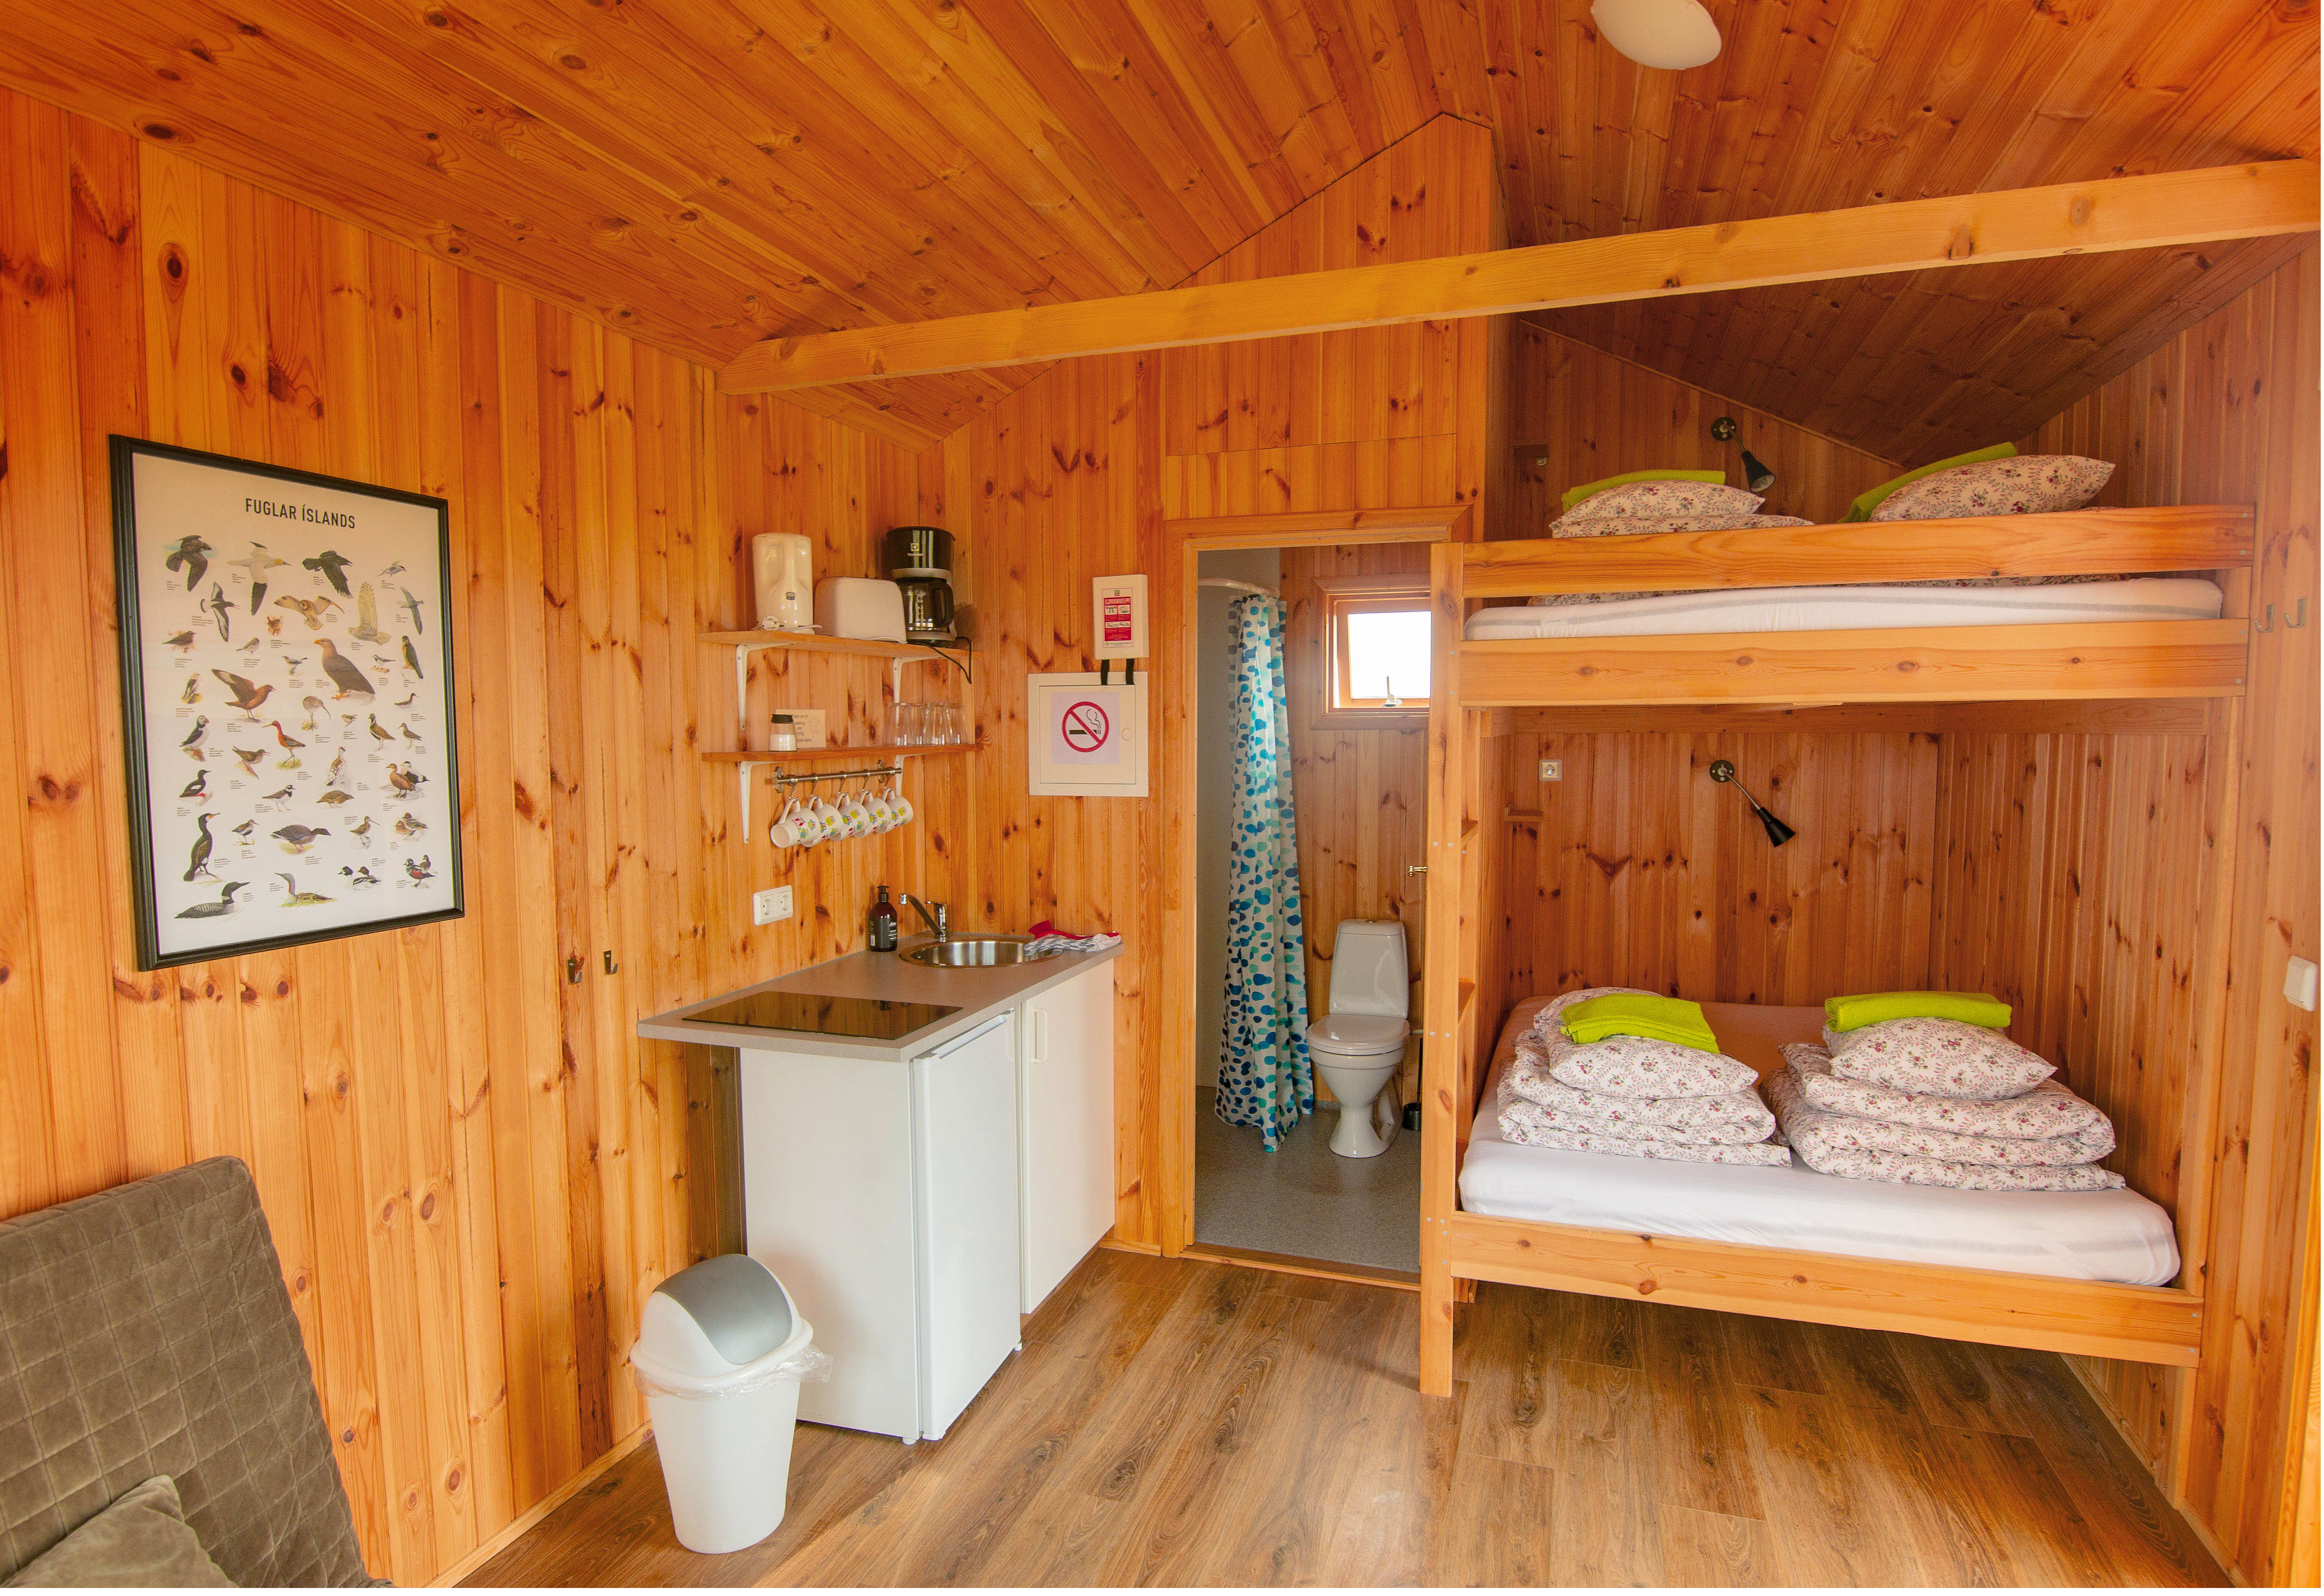 Lambhus Cabin inside